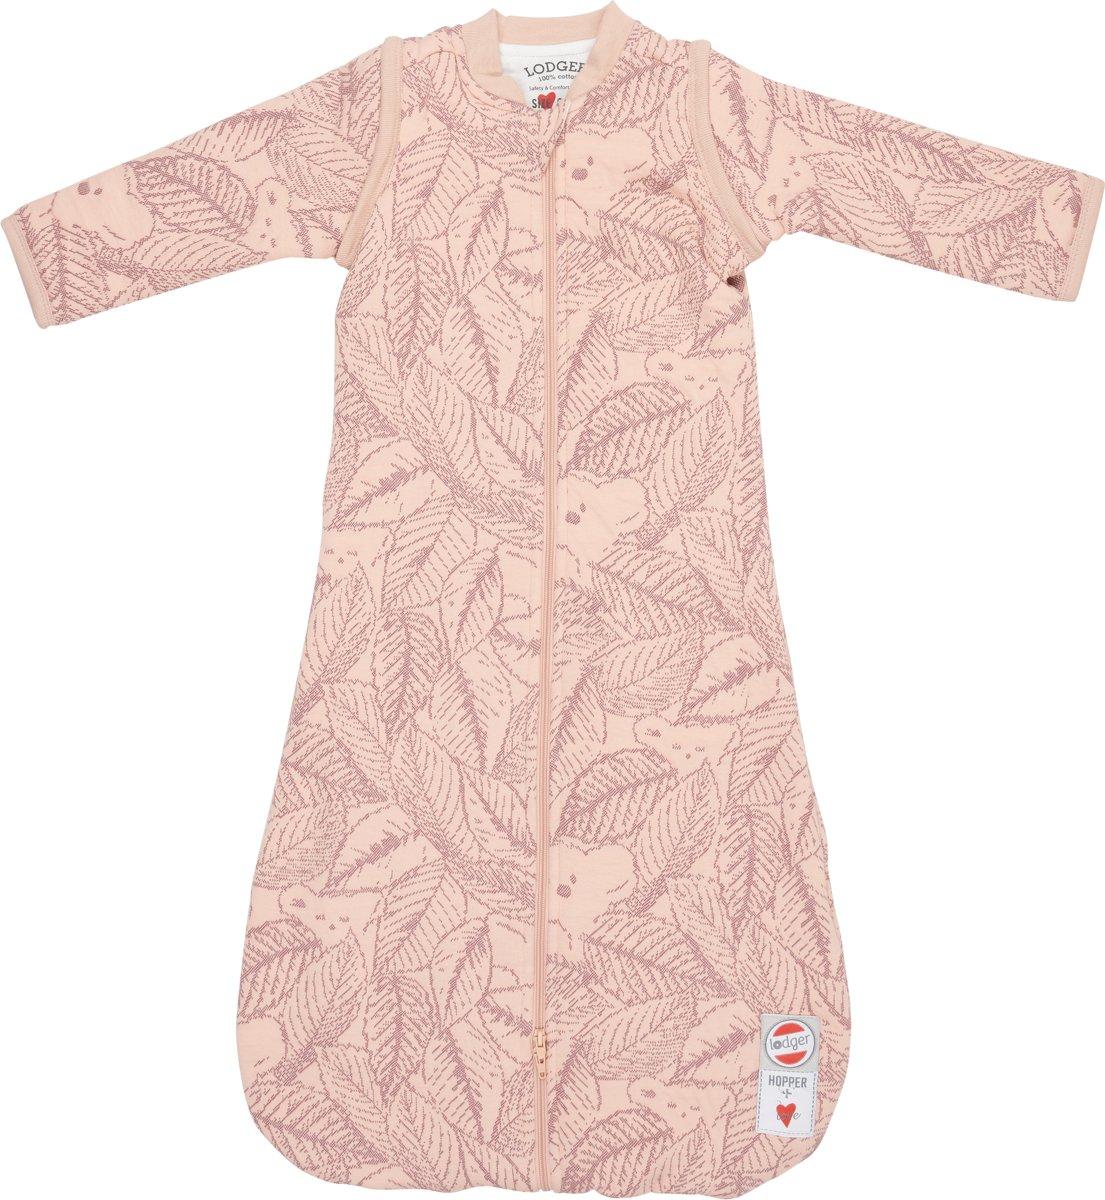 Lodger Baby slaapzak - Hopper Botanimal - Roze - Lange mouw - 86/98